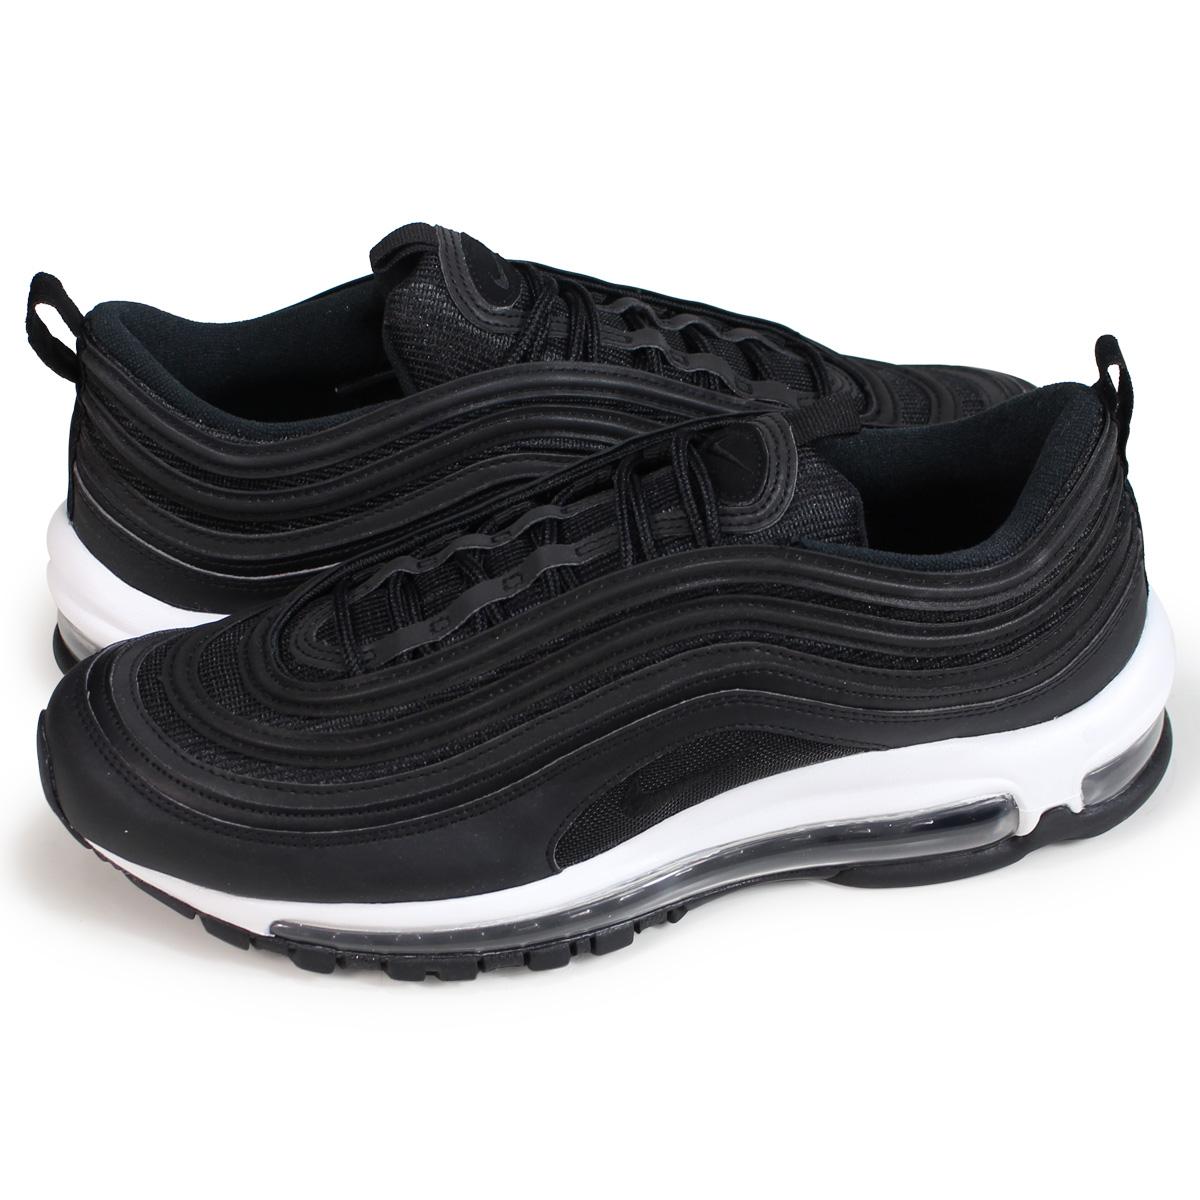 096bcd600a6df Nike NIKE Air Max 97 lady's men's sneakers WMNS AIR MAX 97 921,733-006  black ...